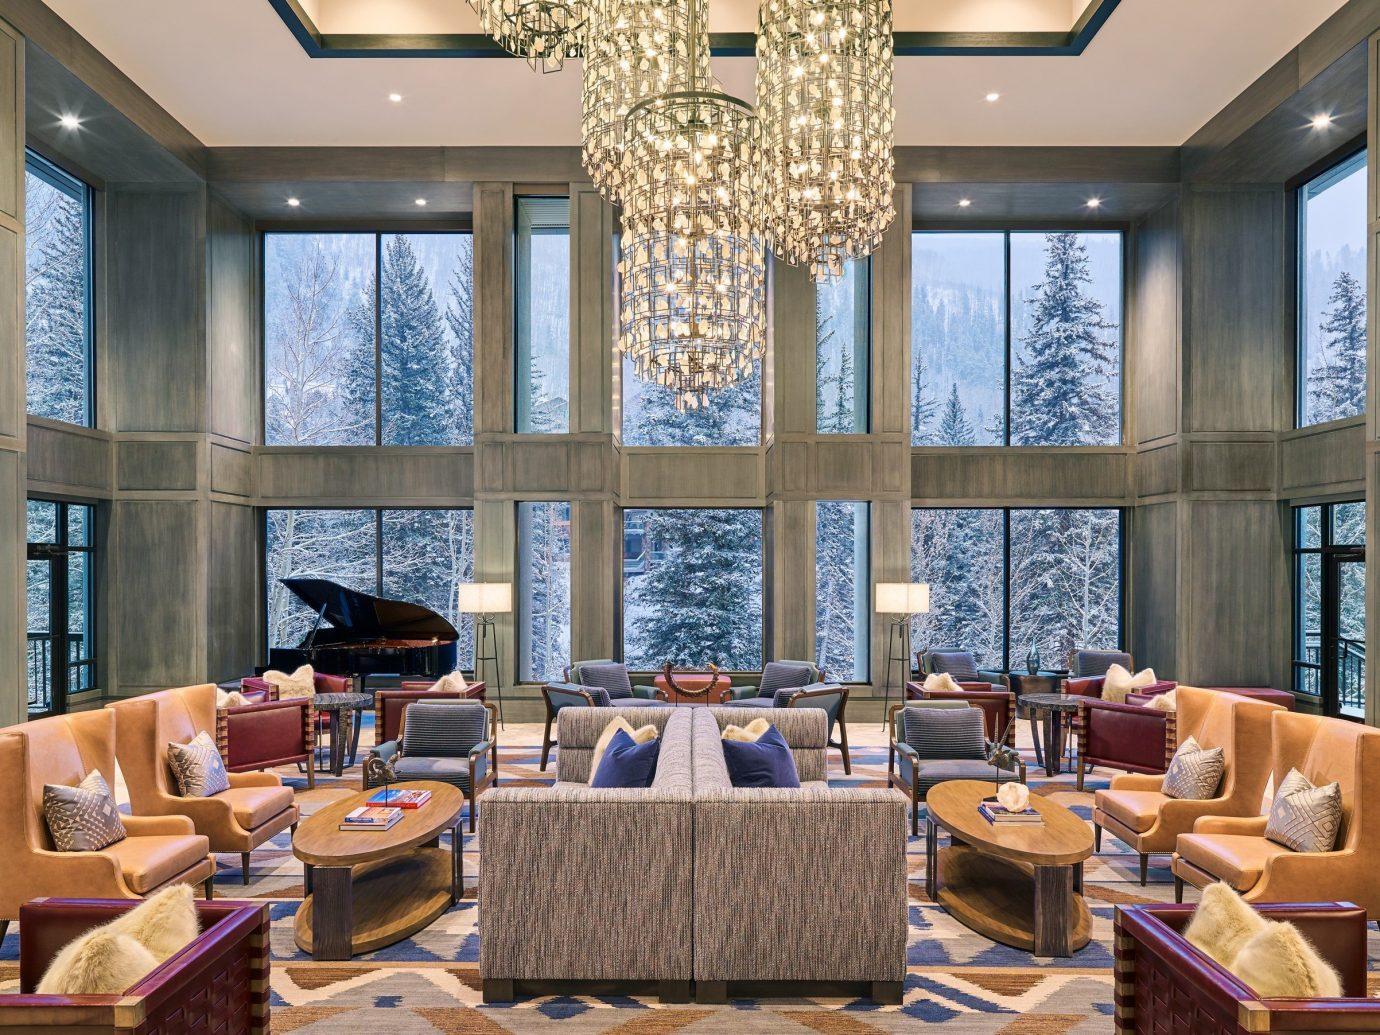 alpine skiing Mountains + Skiing Trip Ideas window indoor interior design living room ceiling Lobby furniture restaurant real estate daylighting